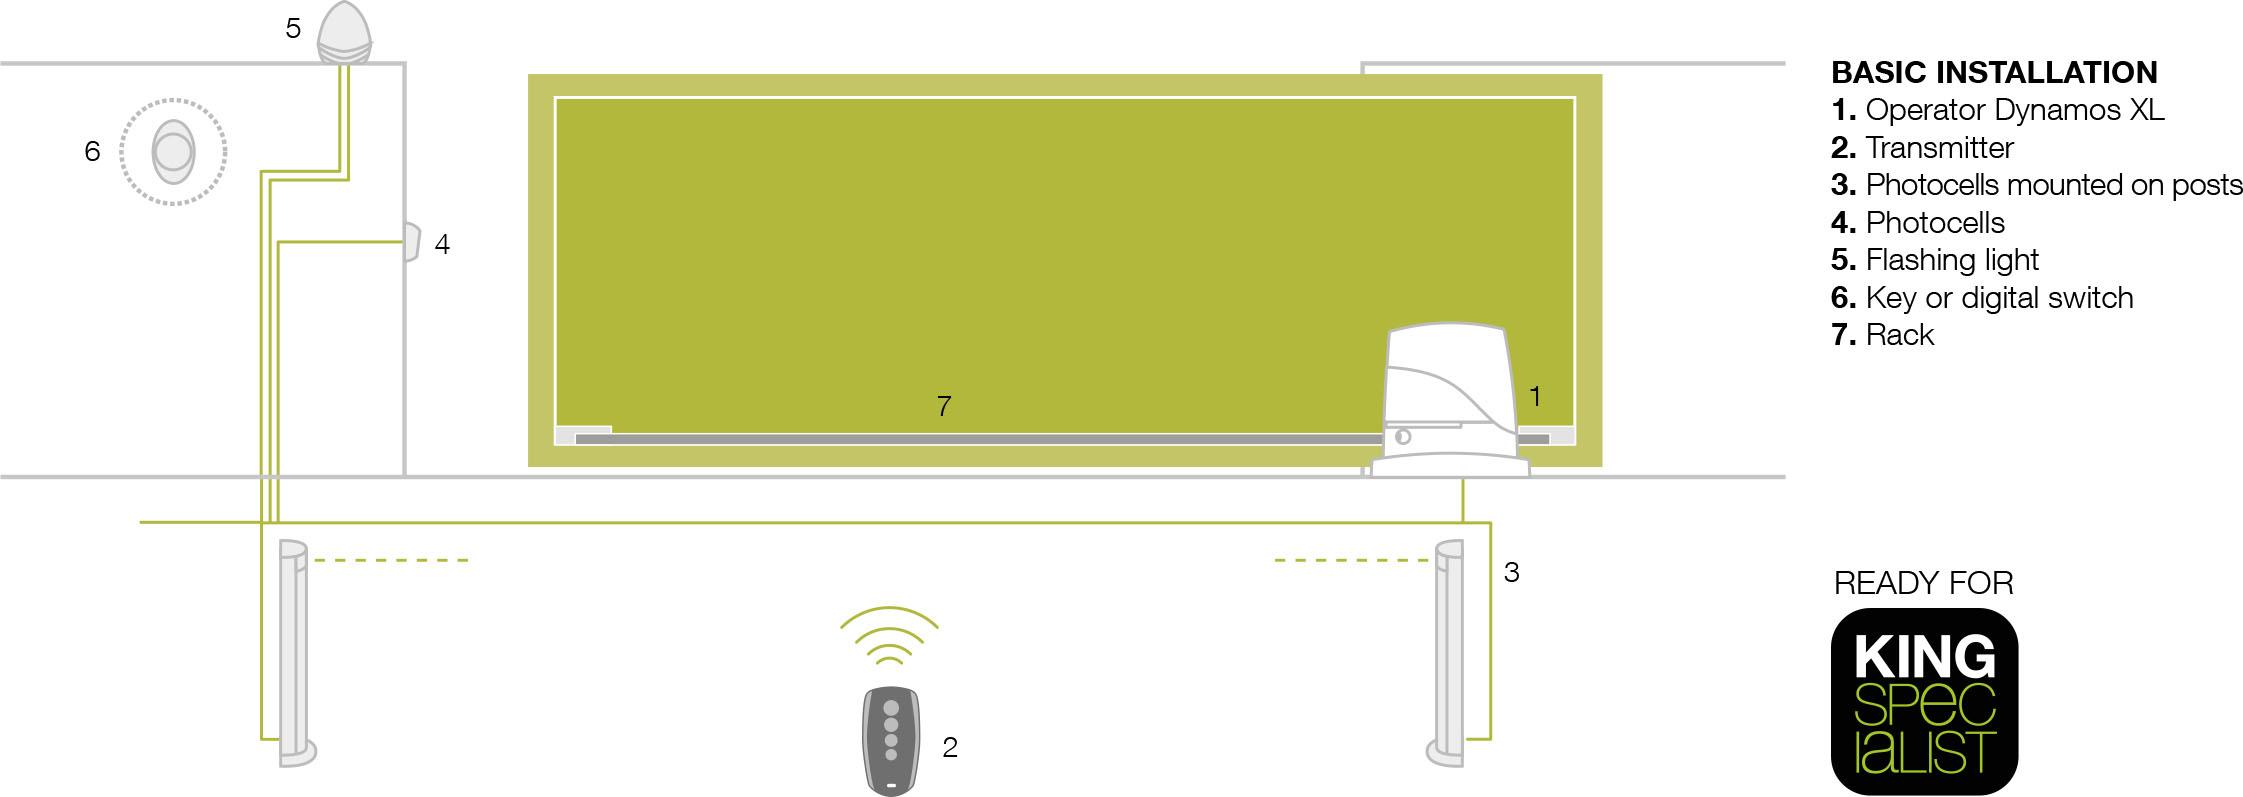 automatic sliding gate double double sliding gate remote control sliding gate sensor gate GSM bluetooth smart control gate heavy duty gate car gate villa residential home entrance gate, Automatic garage door